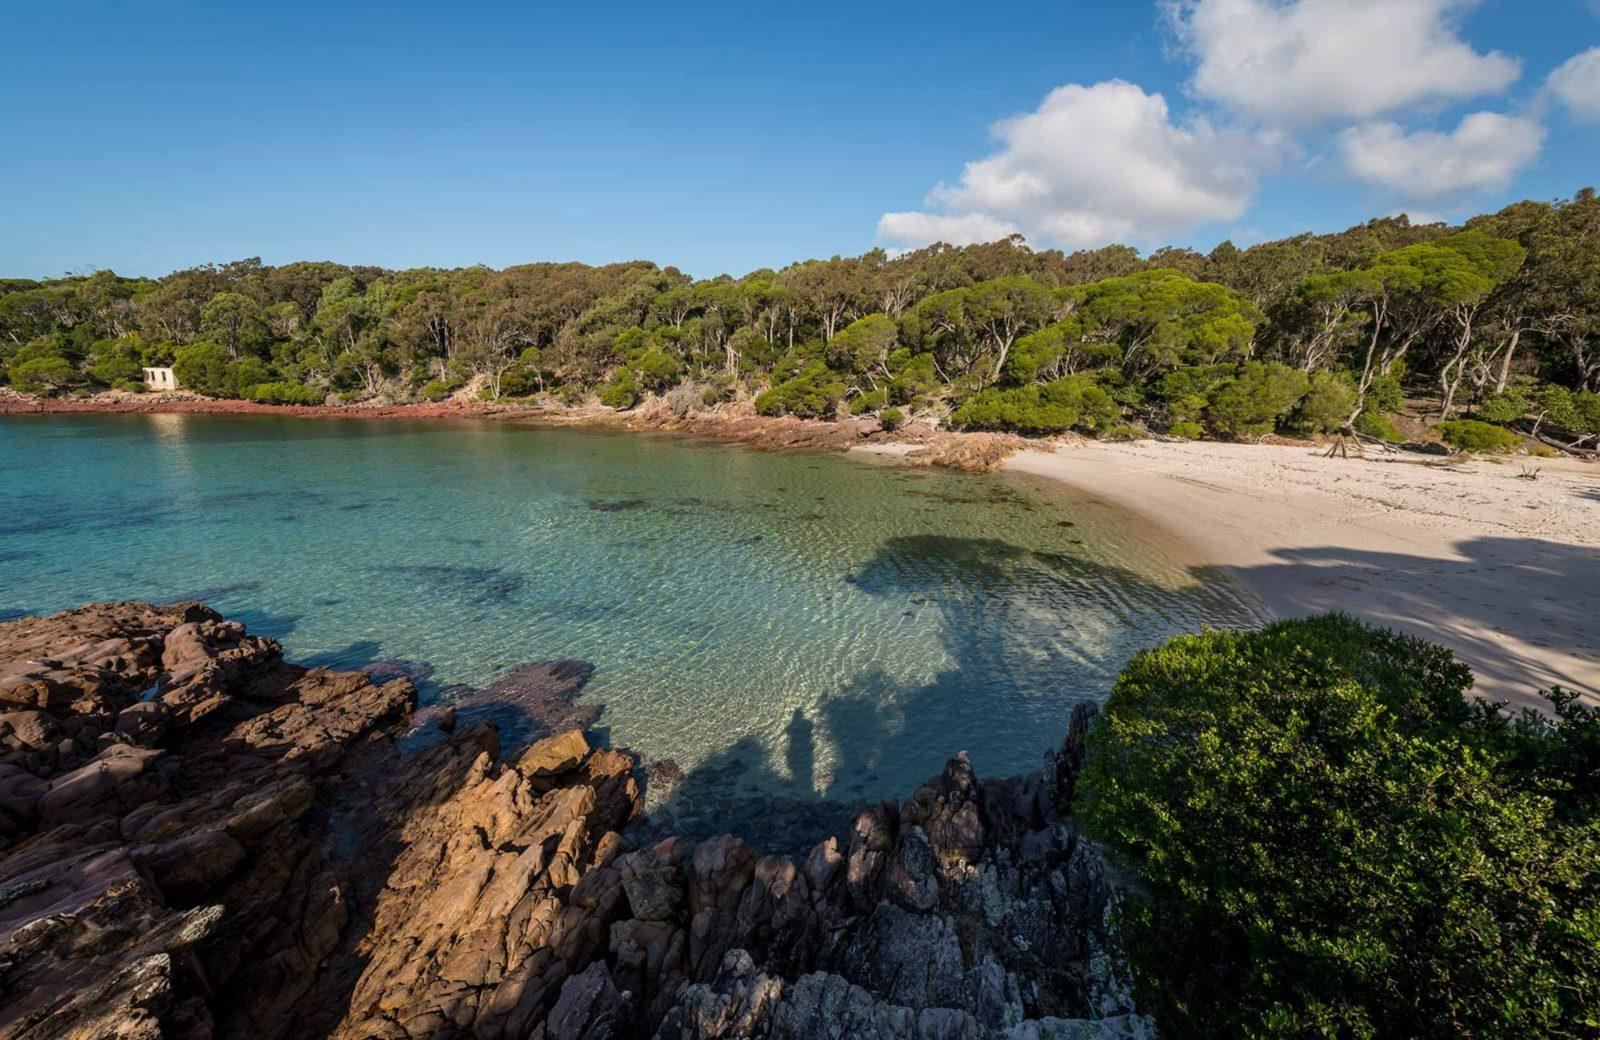 Bittangabee Bay, Ben Boyd National Park. Photo: John Spencer